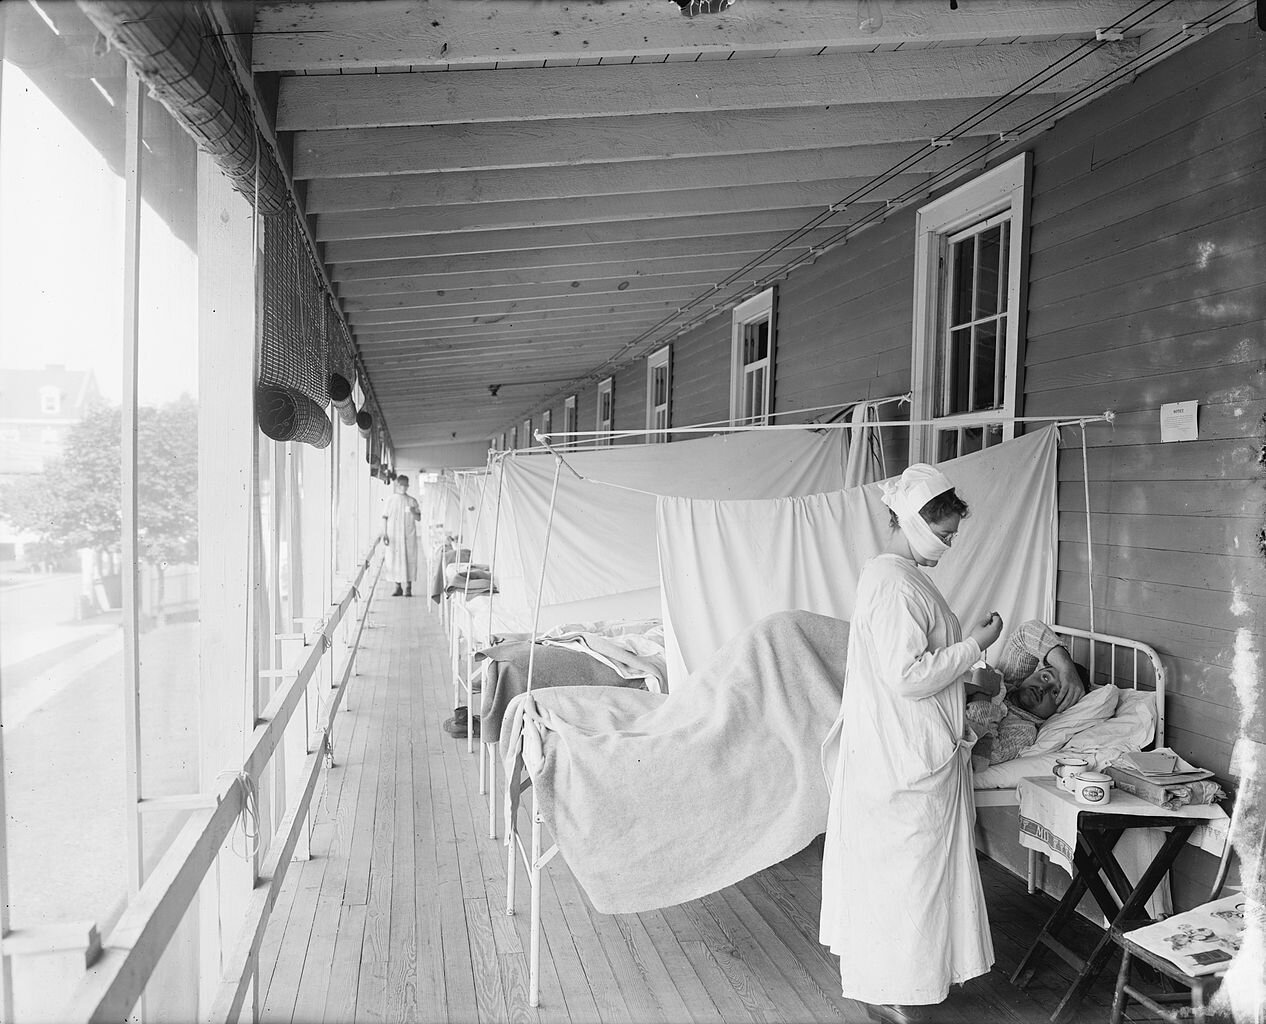 Epidemia grypy hiszpanki Źródło: Harris & Ewing photographers, Epidemia grypy hiszpanki, 1918 - 1919, domena publiczna.